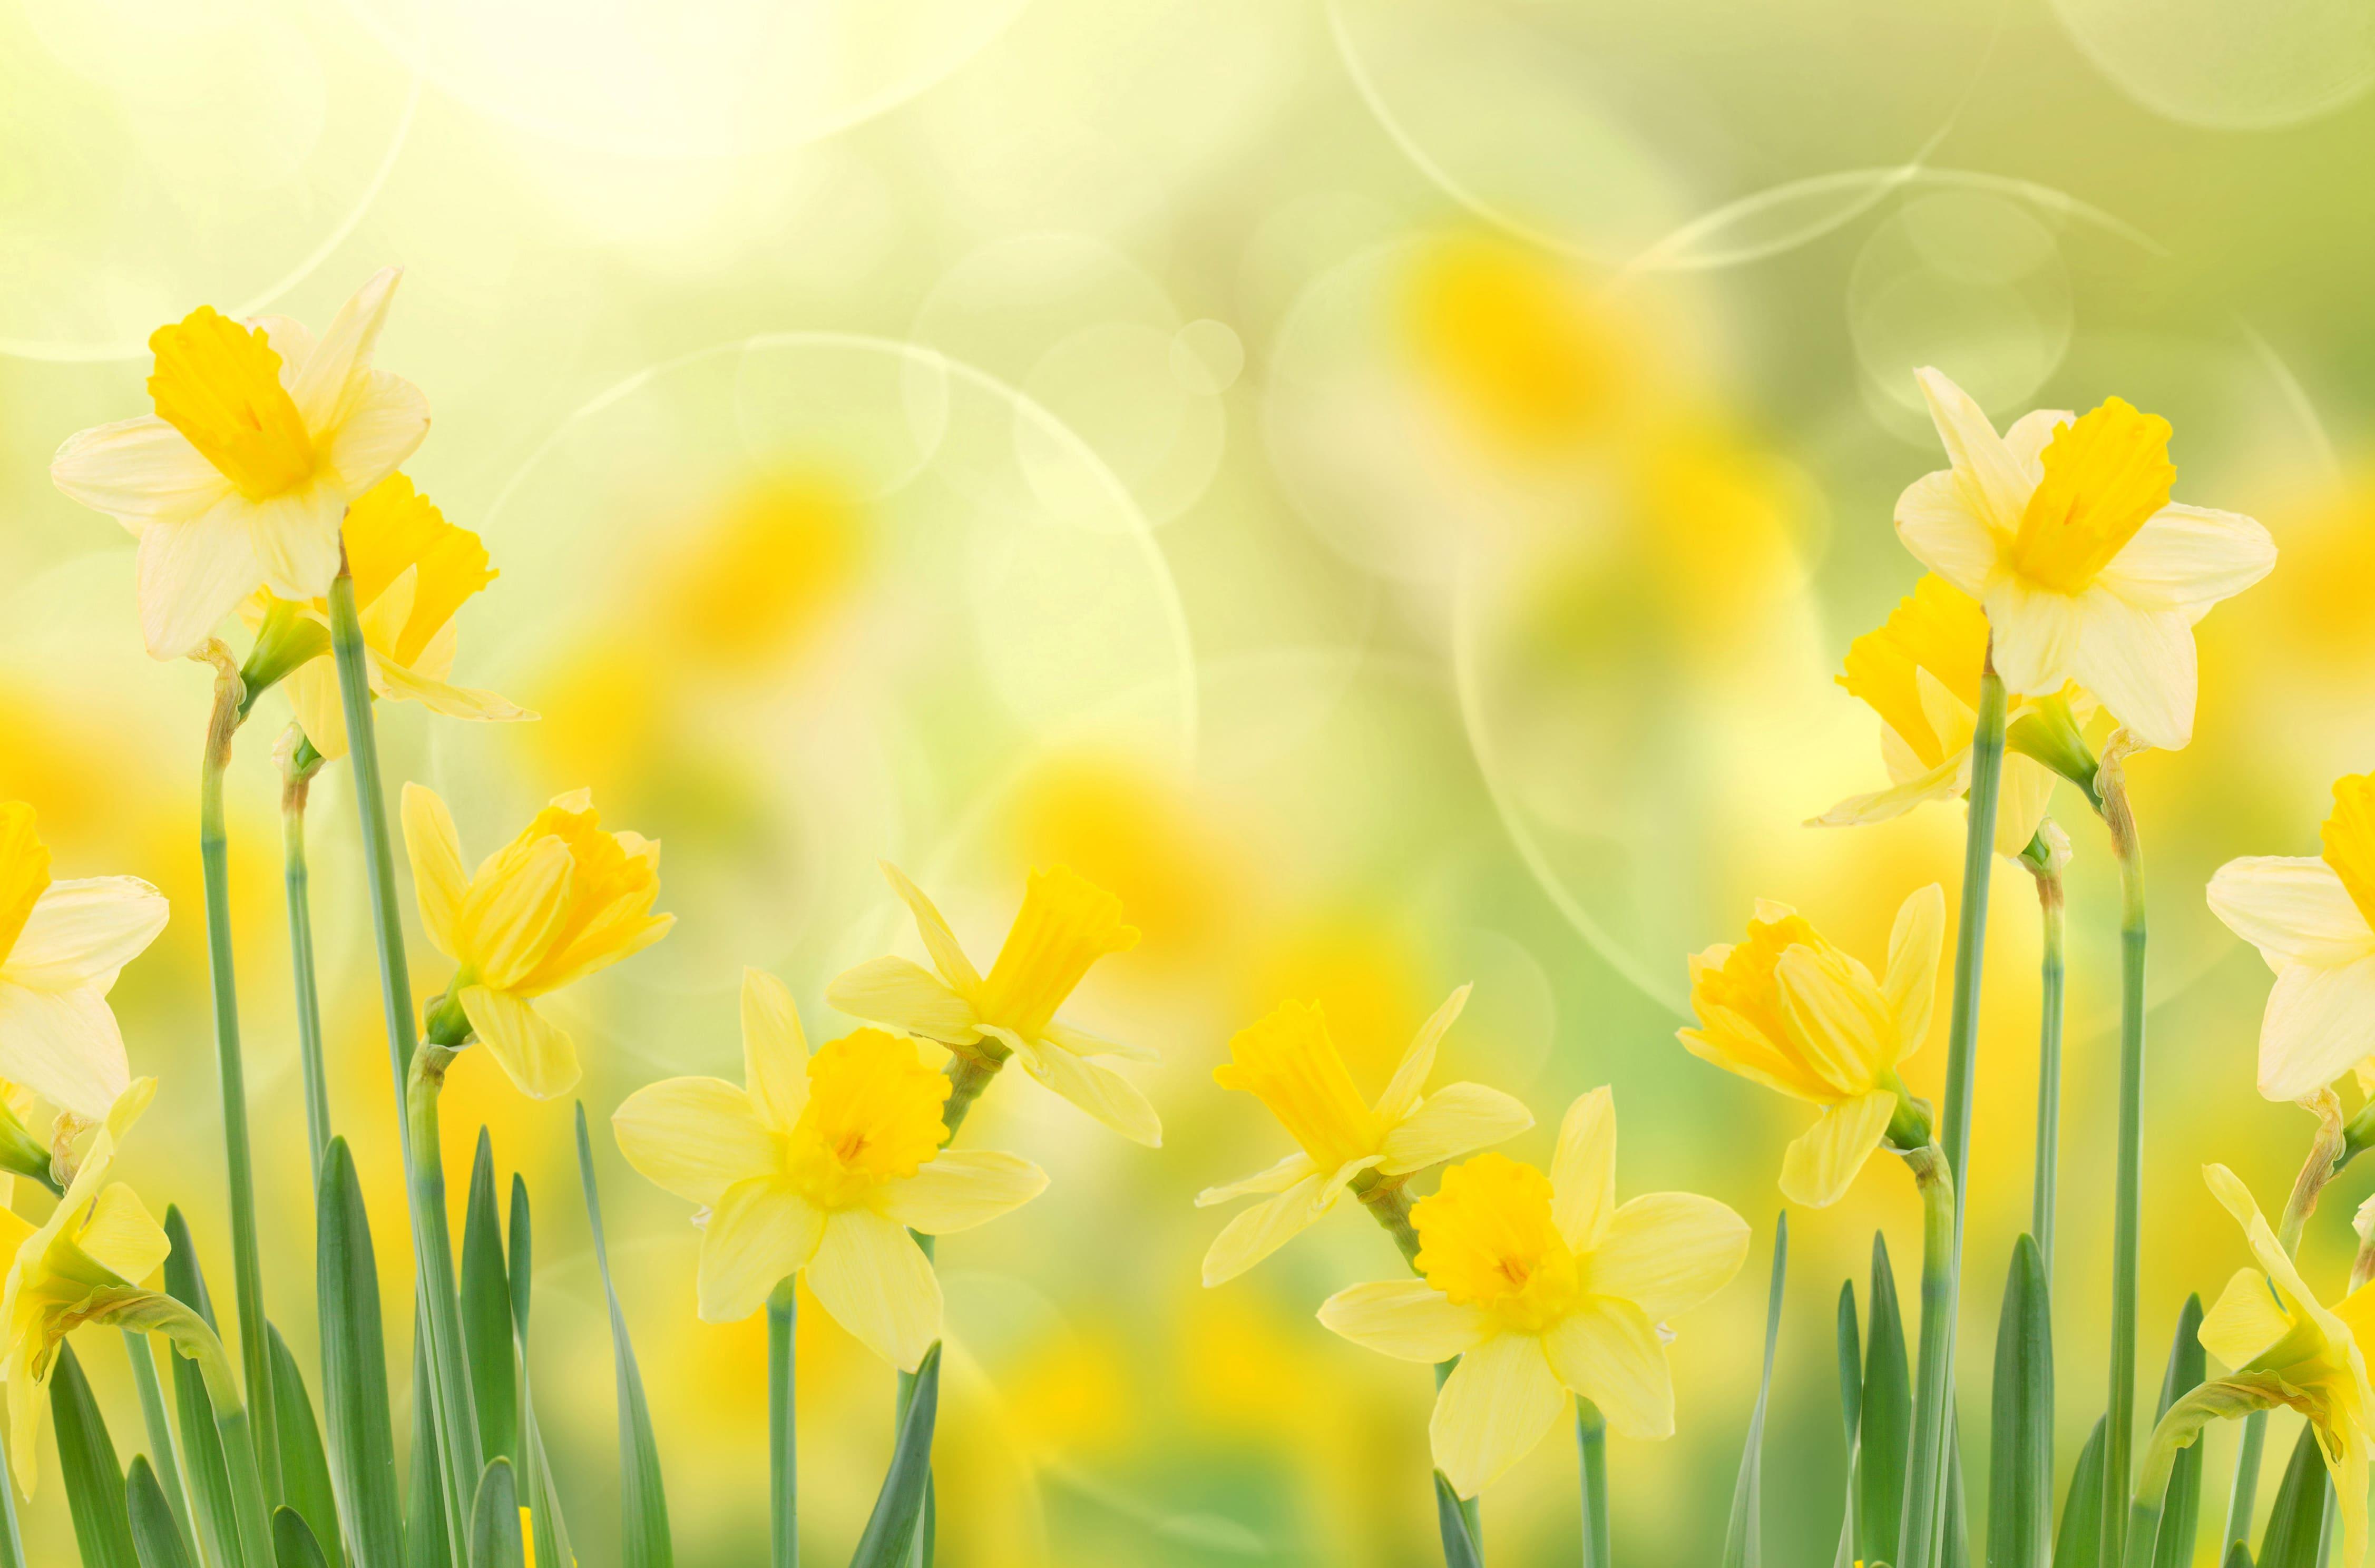 daffodils-photo-76